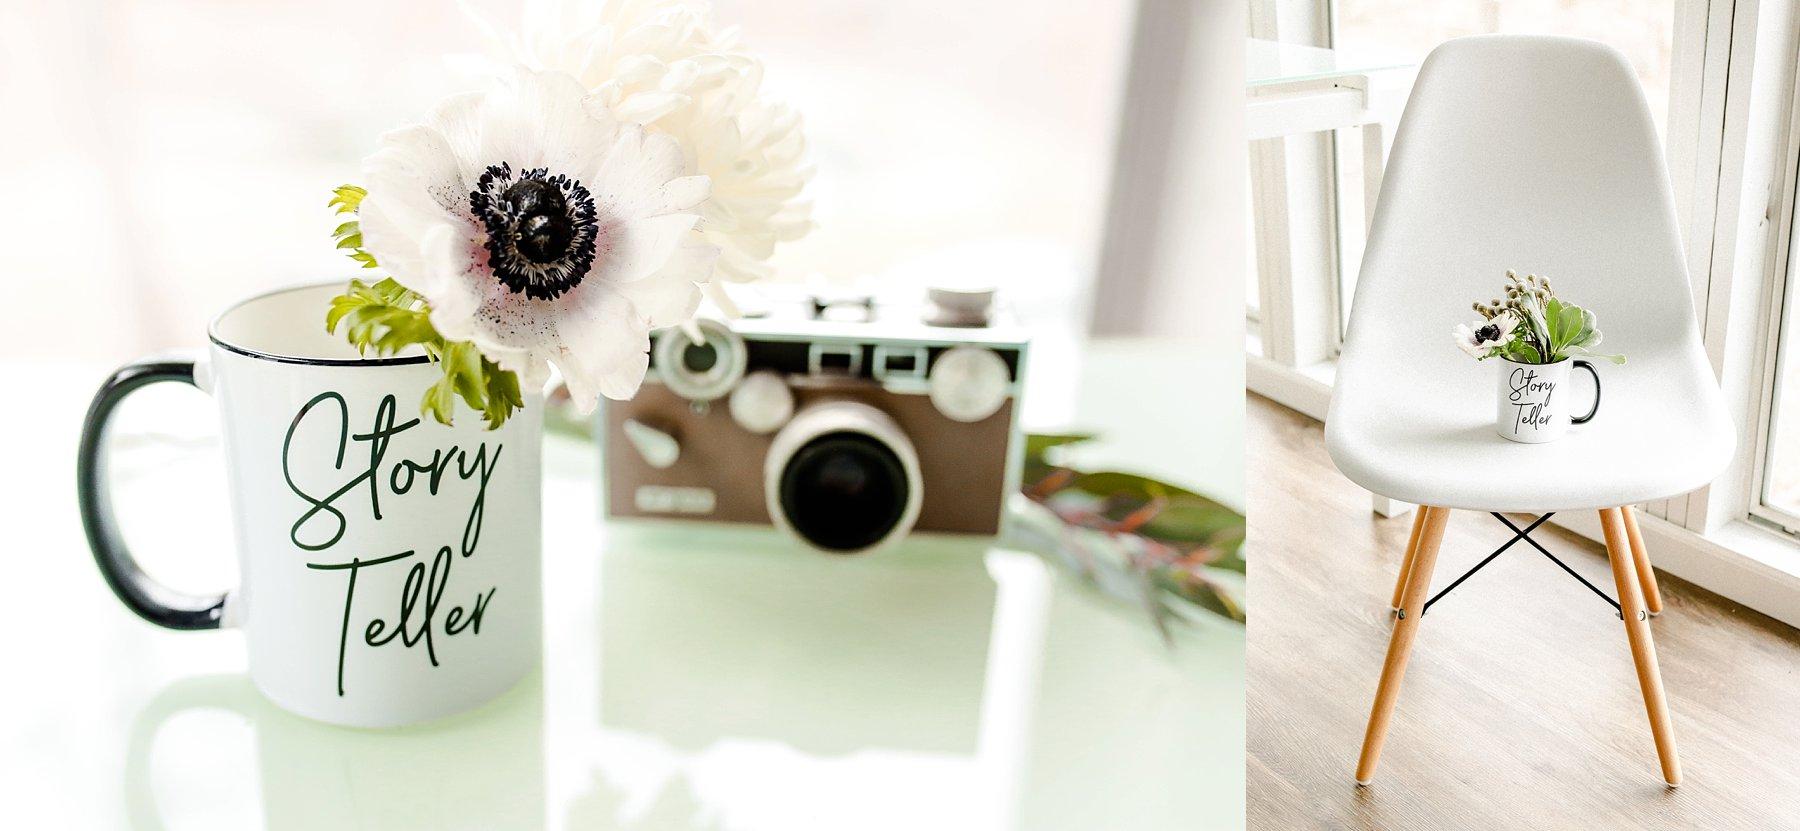 photographer_wedding_saint_louis_Kansas_City_Photography_Videography_workshop_training_styled_engagement_Lake_Ozark_KC_MO_STL_Rolla_Hermann_Saint_James_0444.jpg